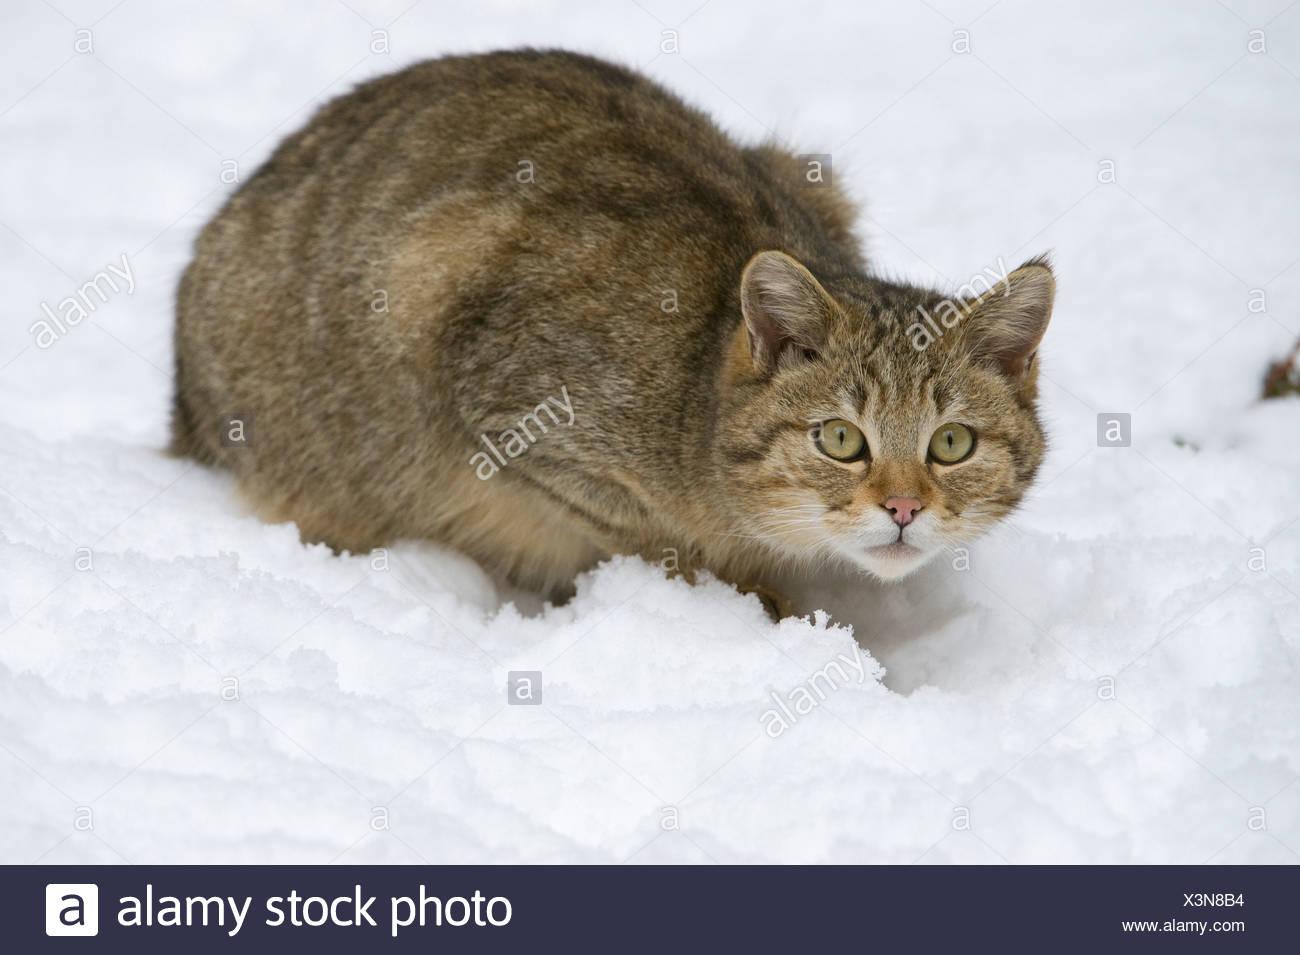 Wild Cat (Felis silvestris) in the snow, Bavarian Forest National Park, enclosed area, Neuschoenau, Bavaria, Germany, Europe - Stock Image